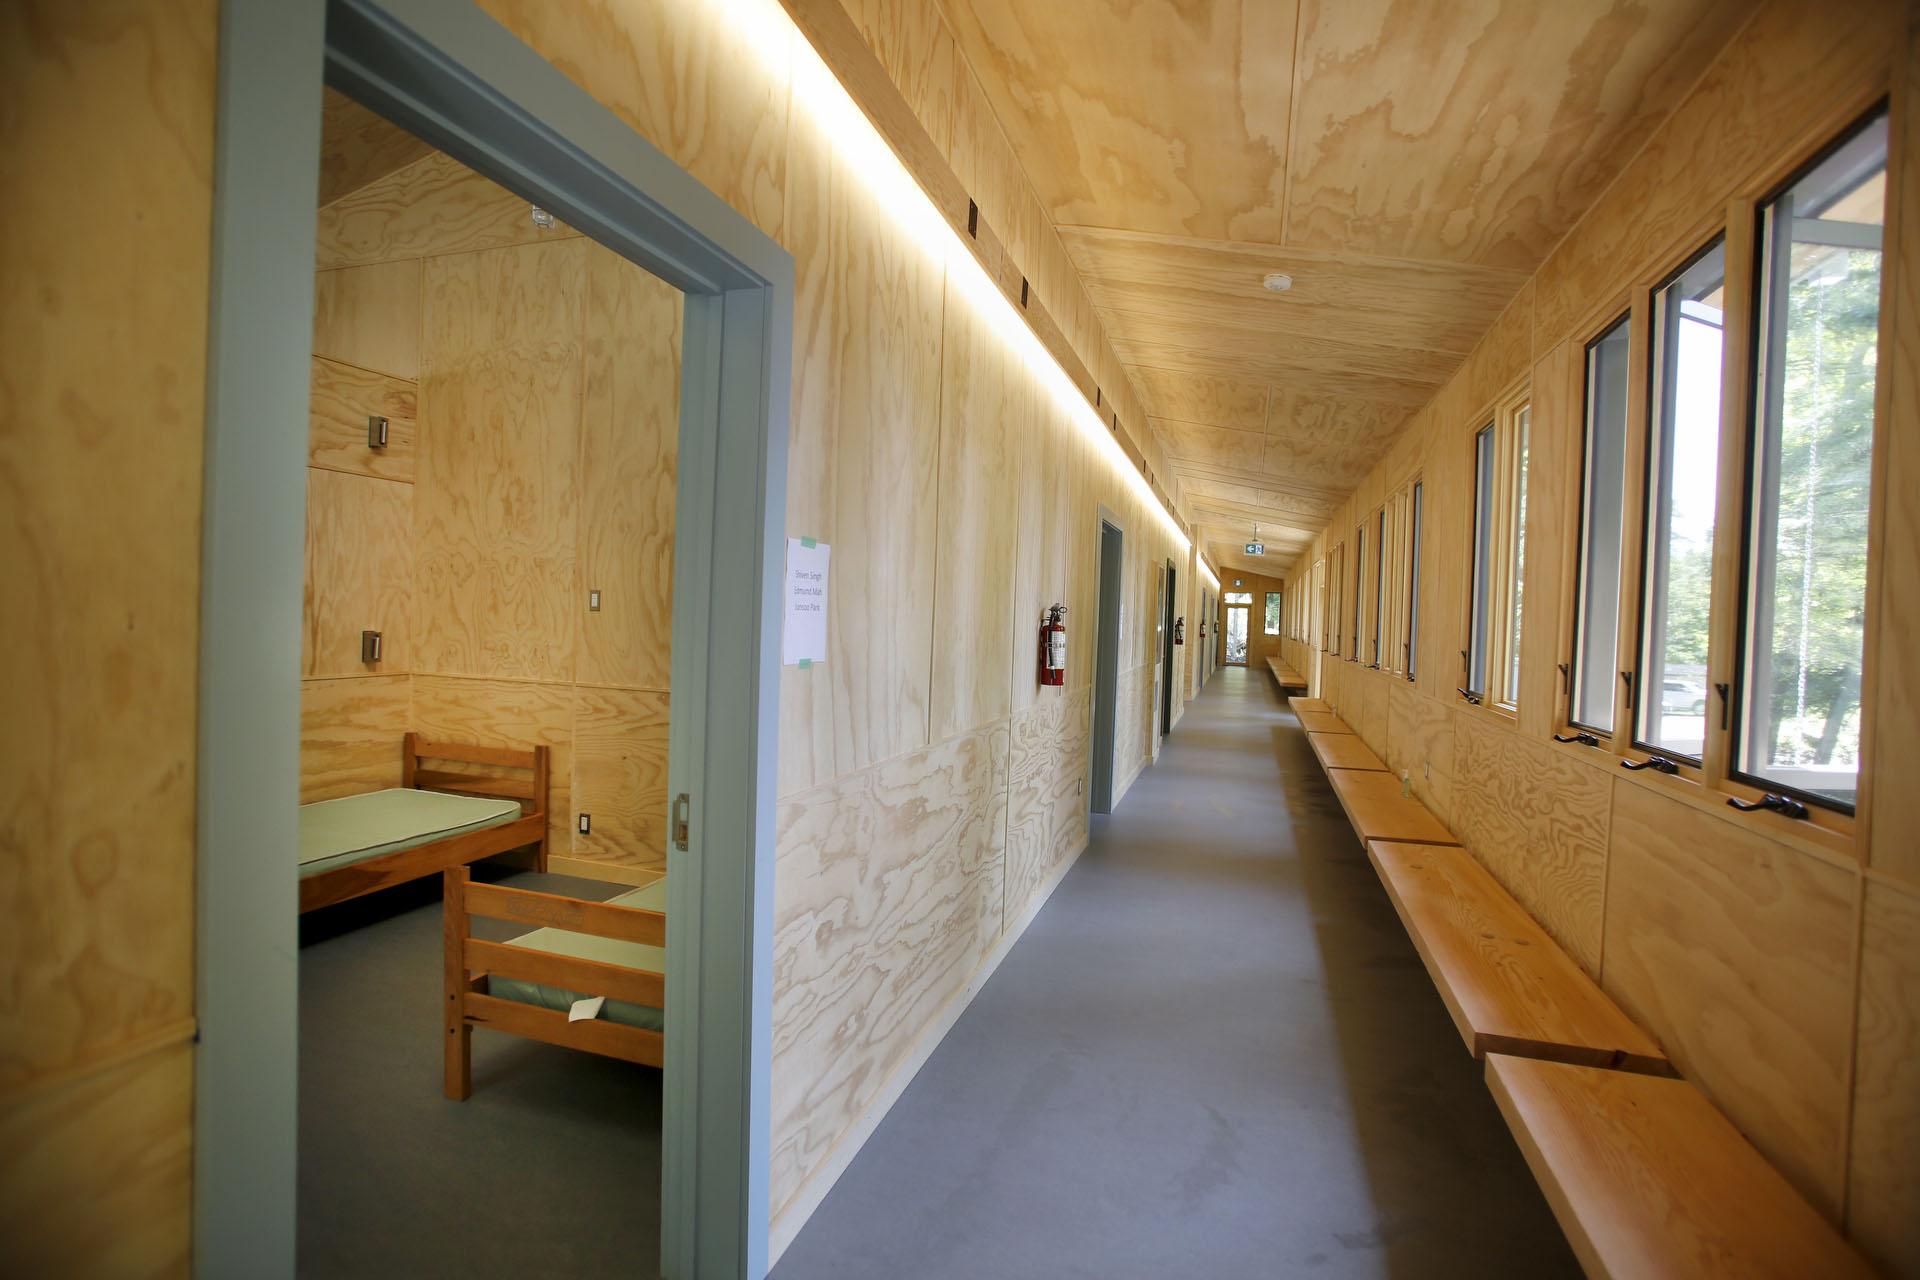 HCAT Bunkhouse